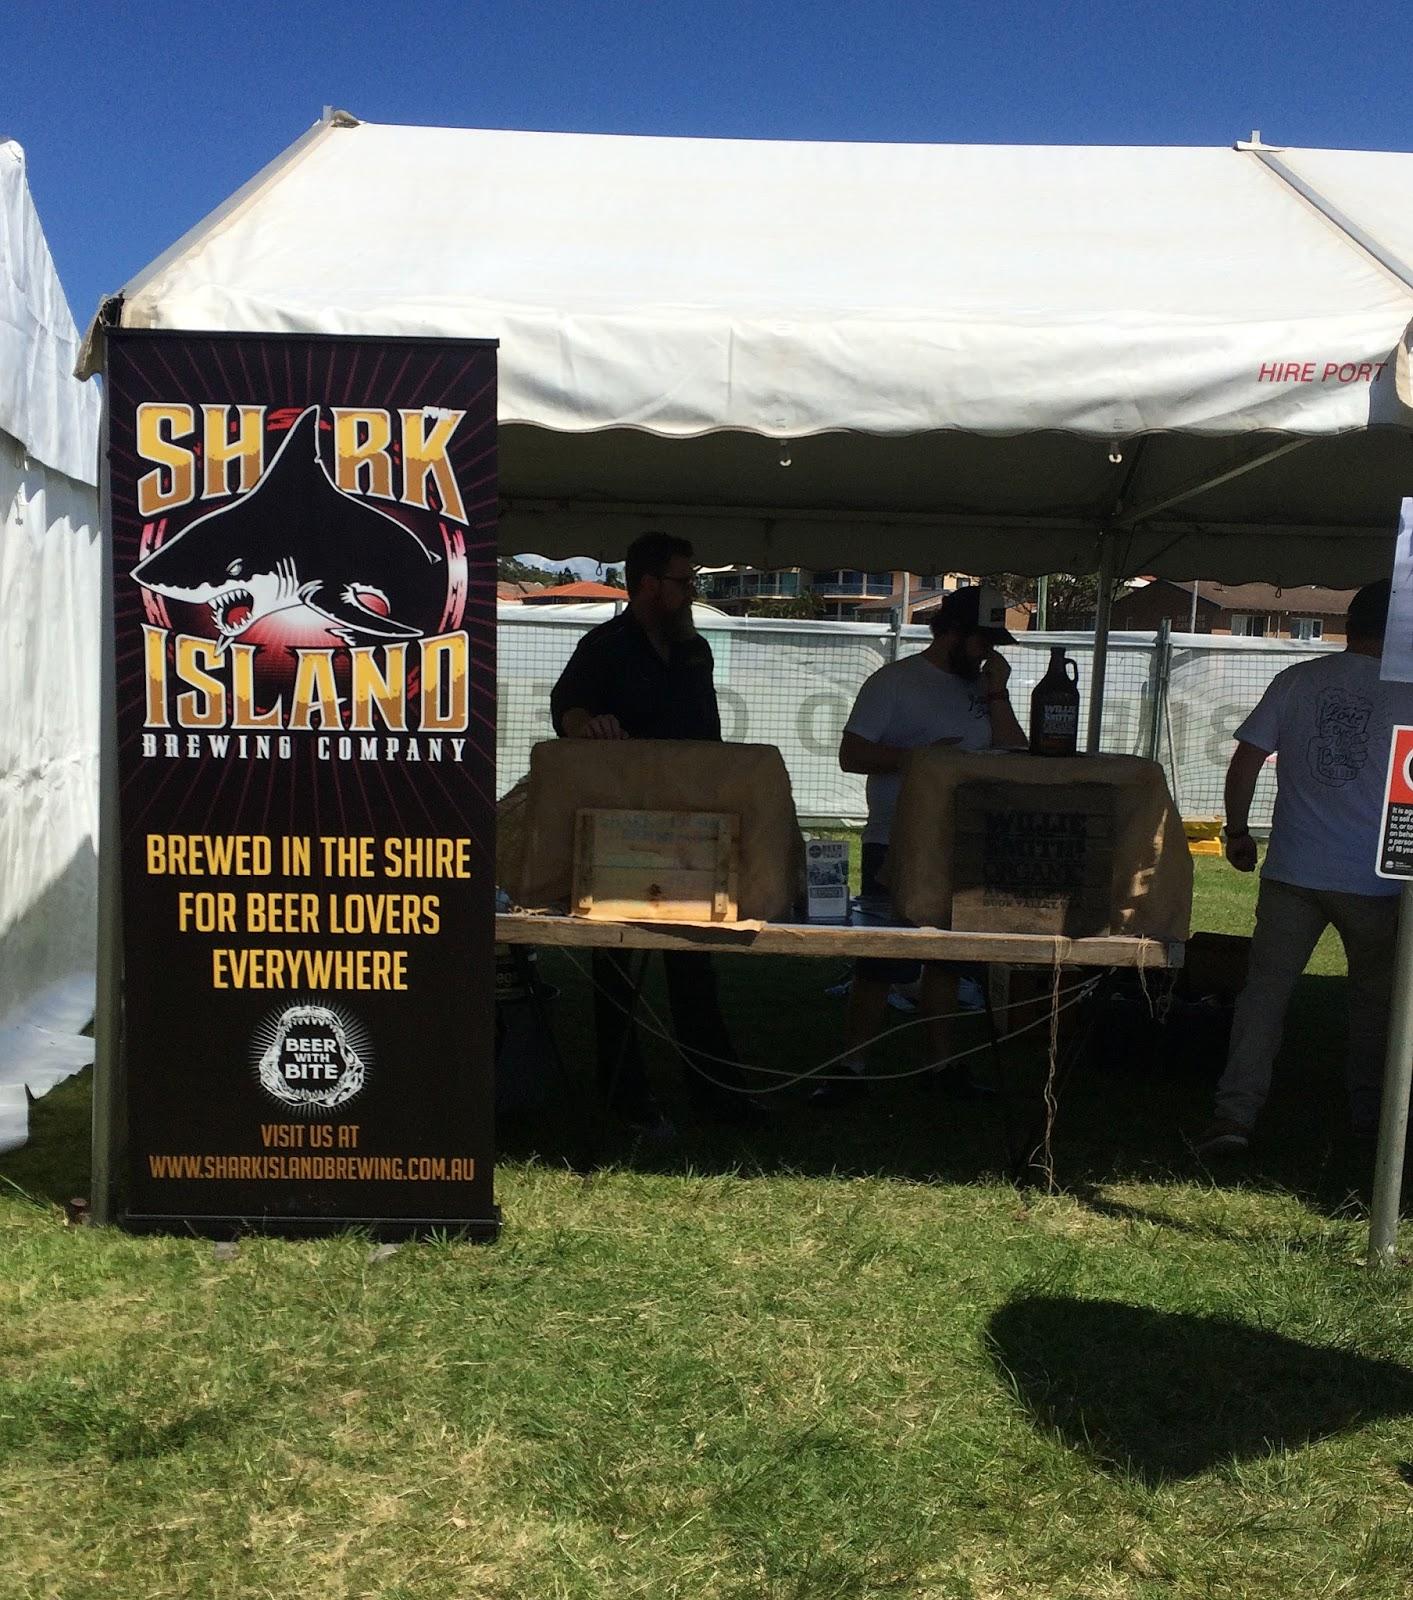 Port Macquarie Beer and Cider Festival Shark Island